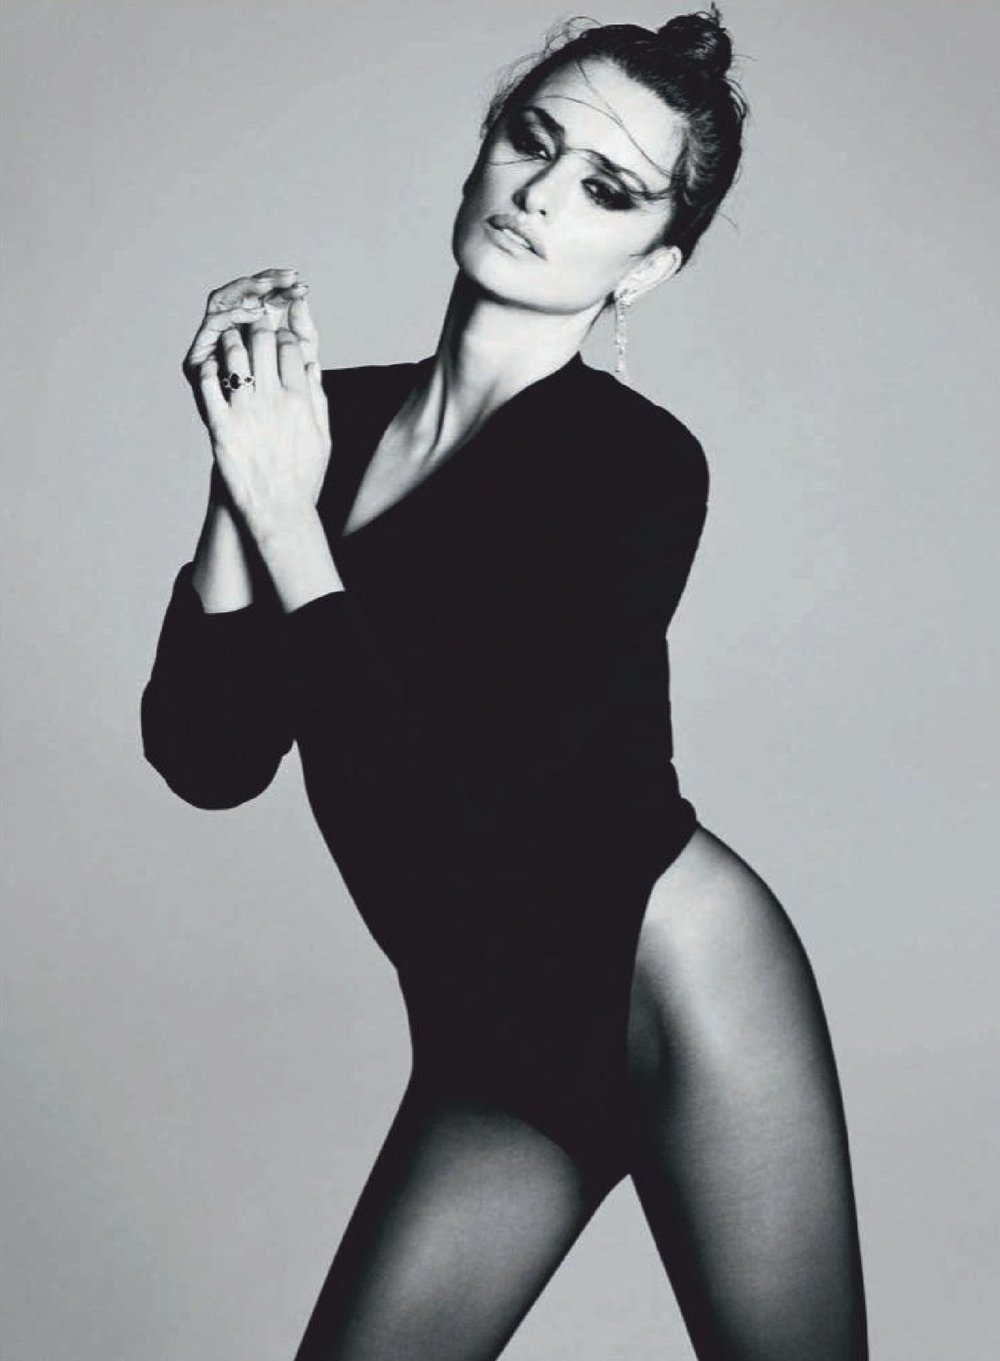 Penelope-Cruz-Luigi-Iango-Vogue-Spain-April-2019- (6).jpg